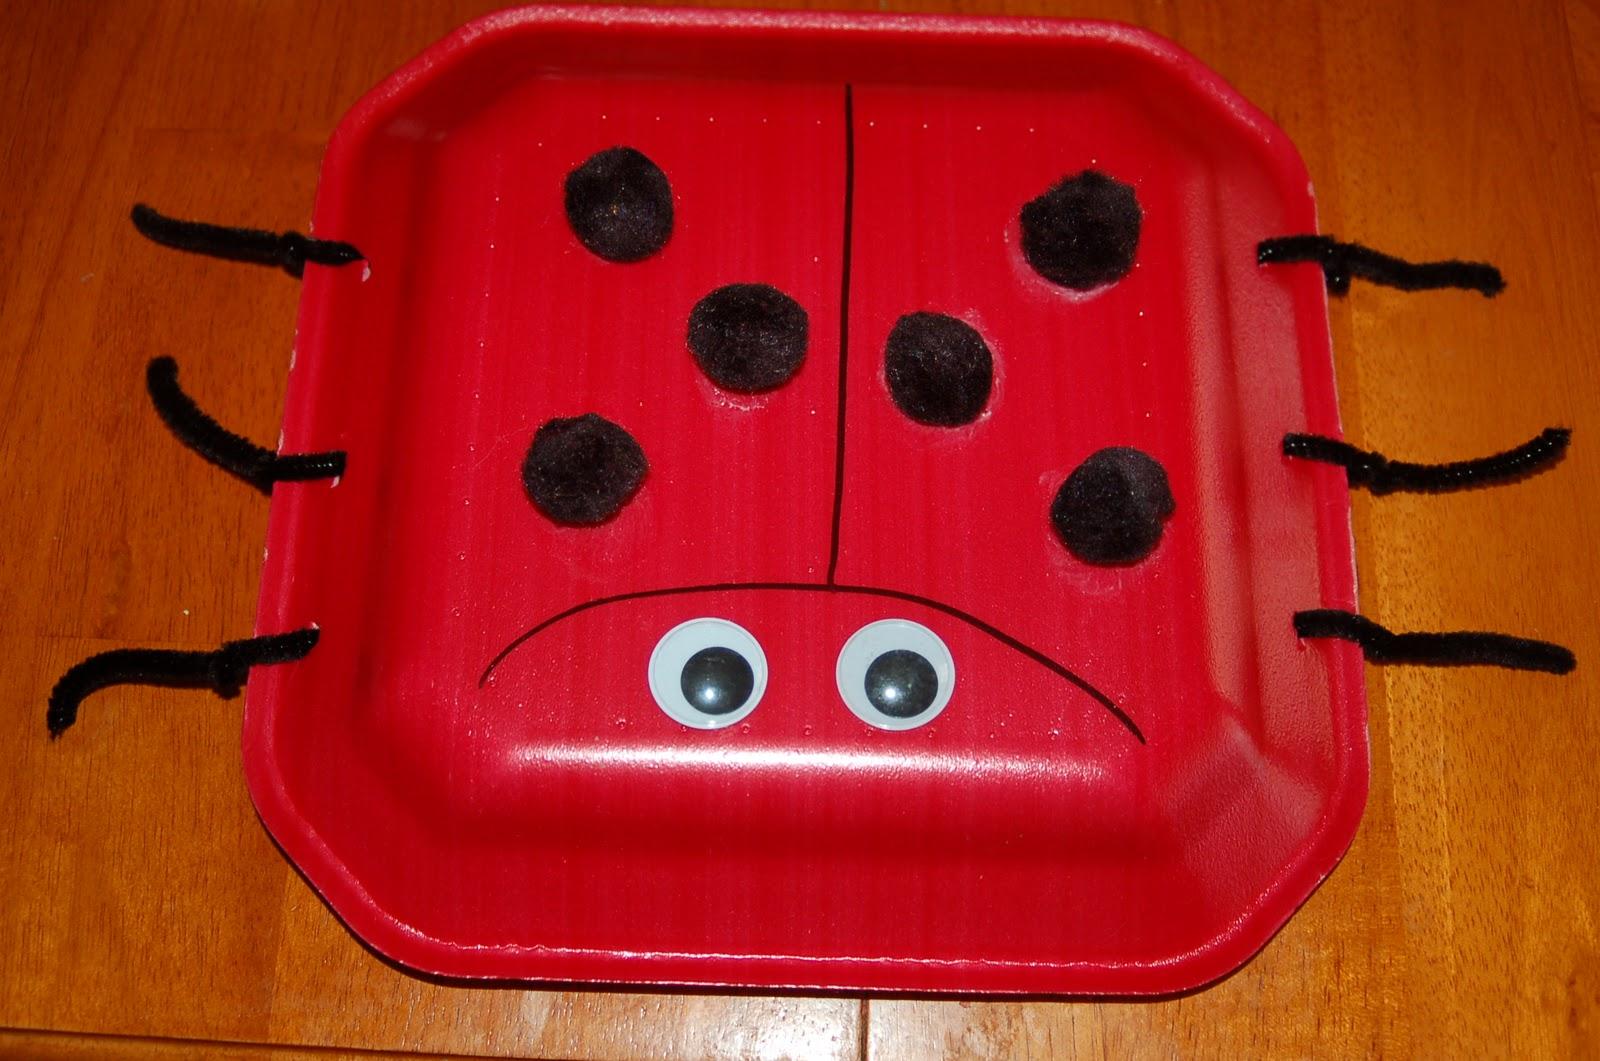 Ladybug Paper Plate Craft with Pom Poms & Ladybug Paper Plate Craft with Pom Poms - Surviving A Teacheru0027s Salary